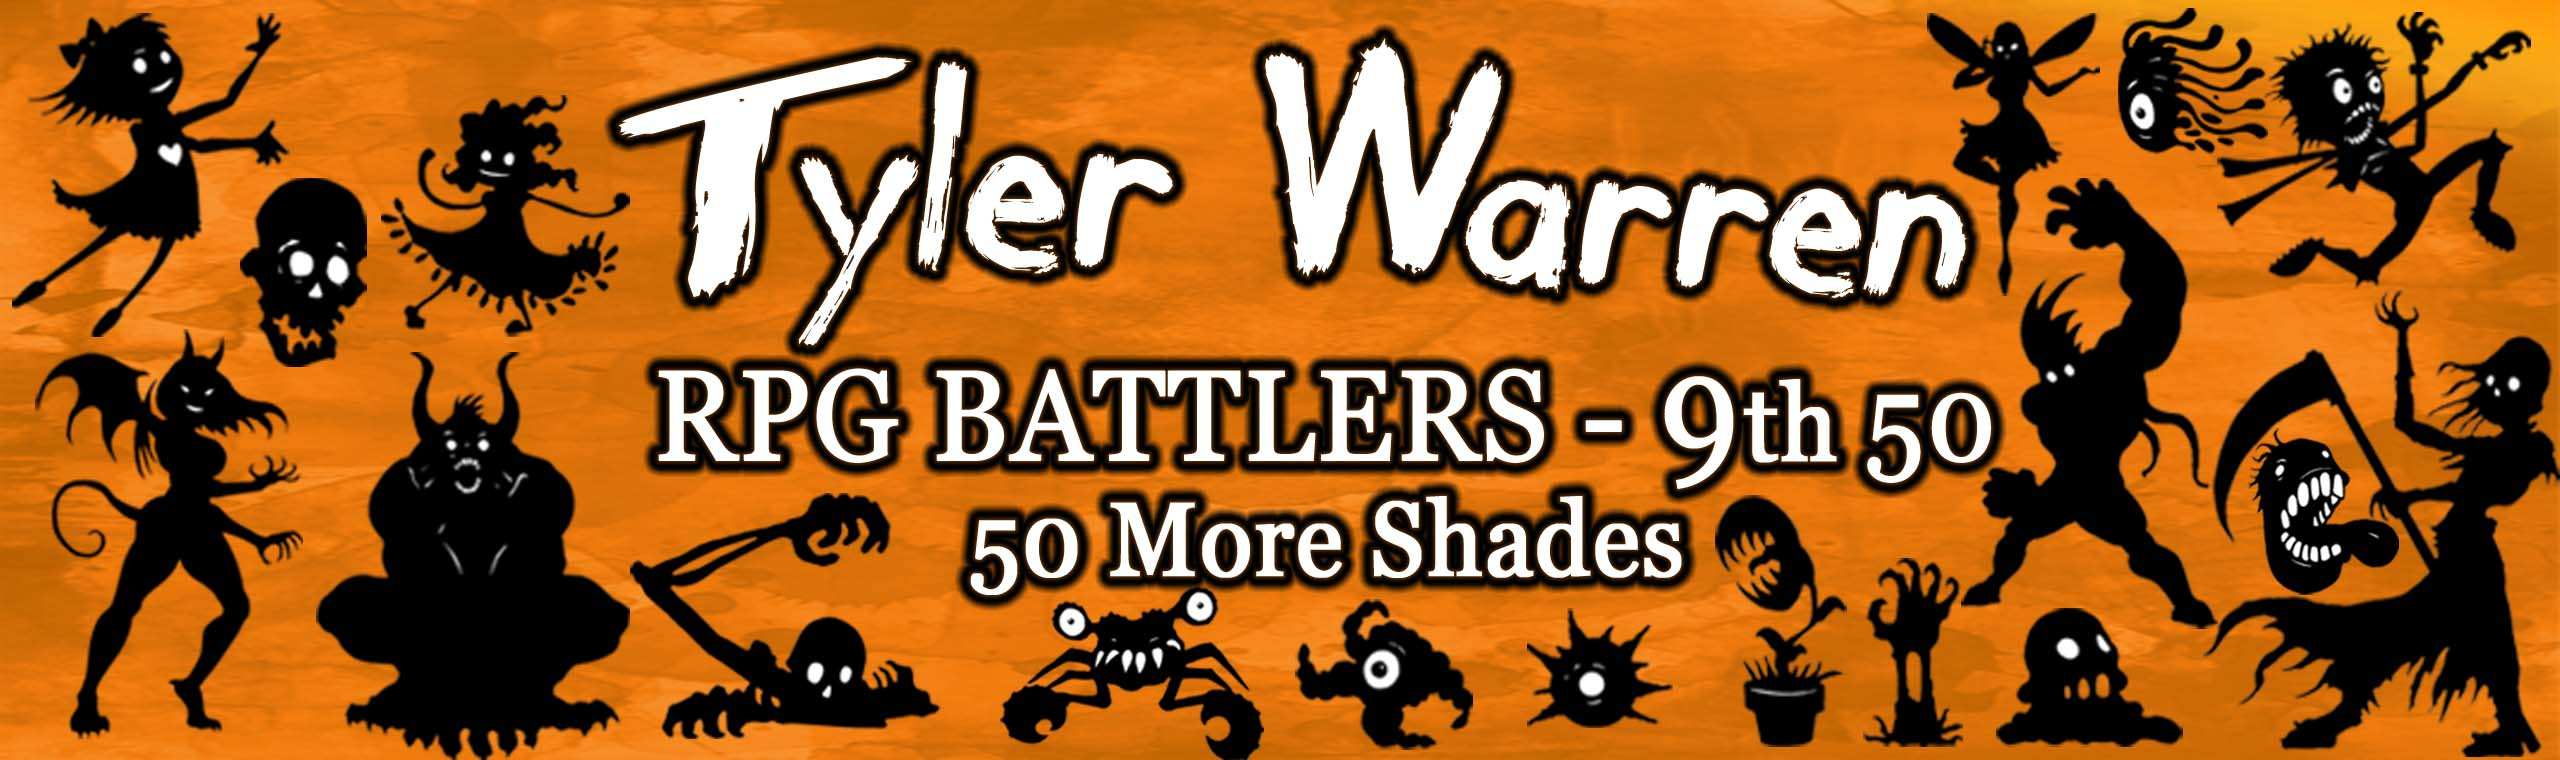 Tyler Warren RPG Battlers 9th 50 - 50 More Shades